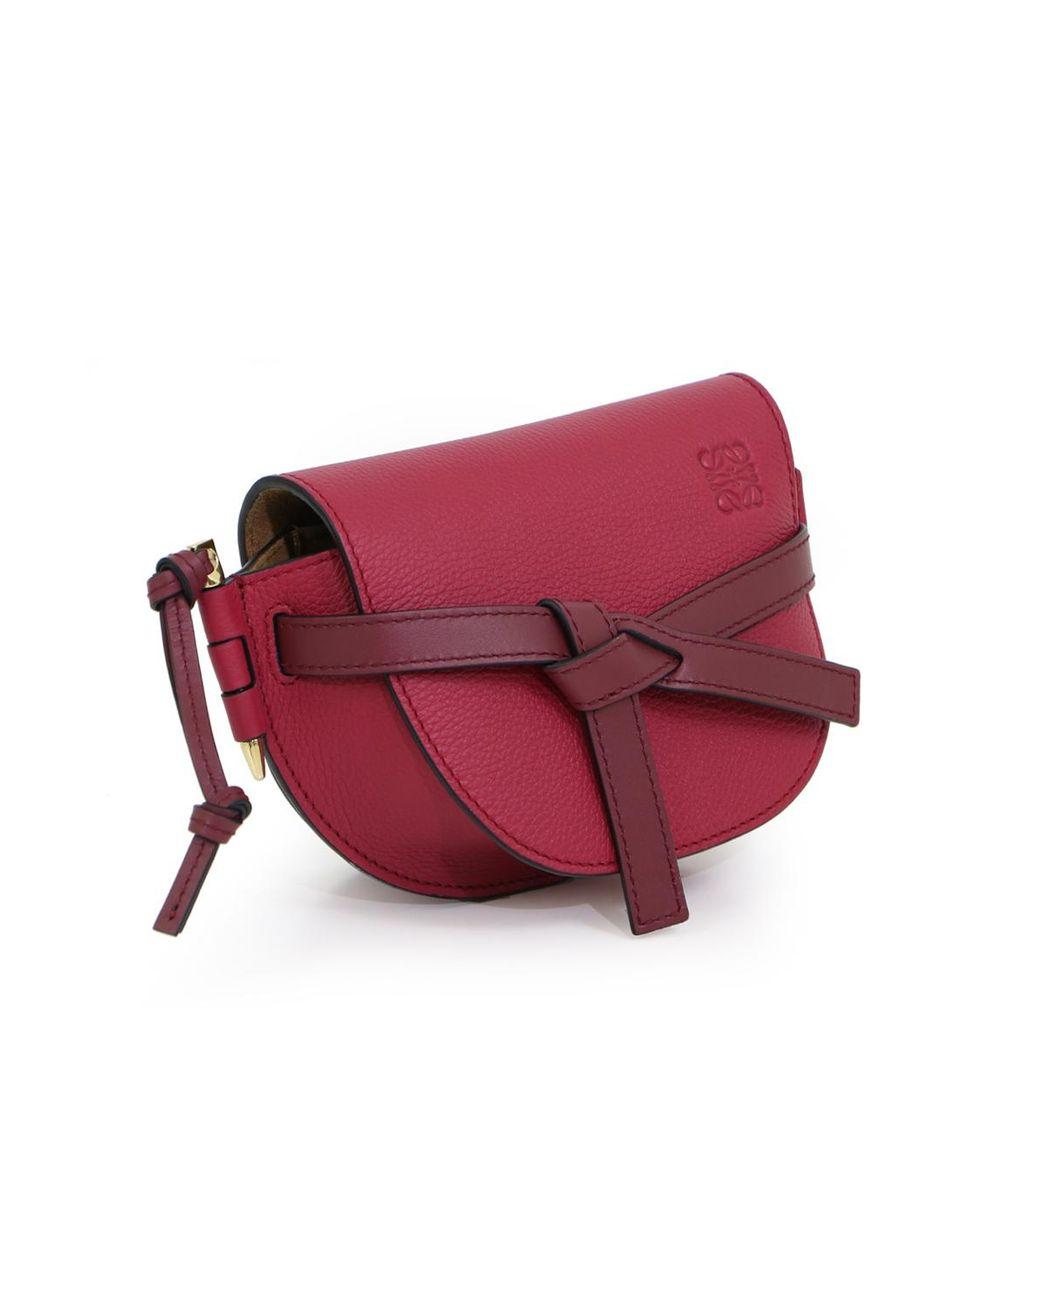 fba7eb6c869 Women's Red Gate Mini Bag Raspberry/wine